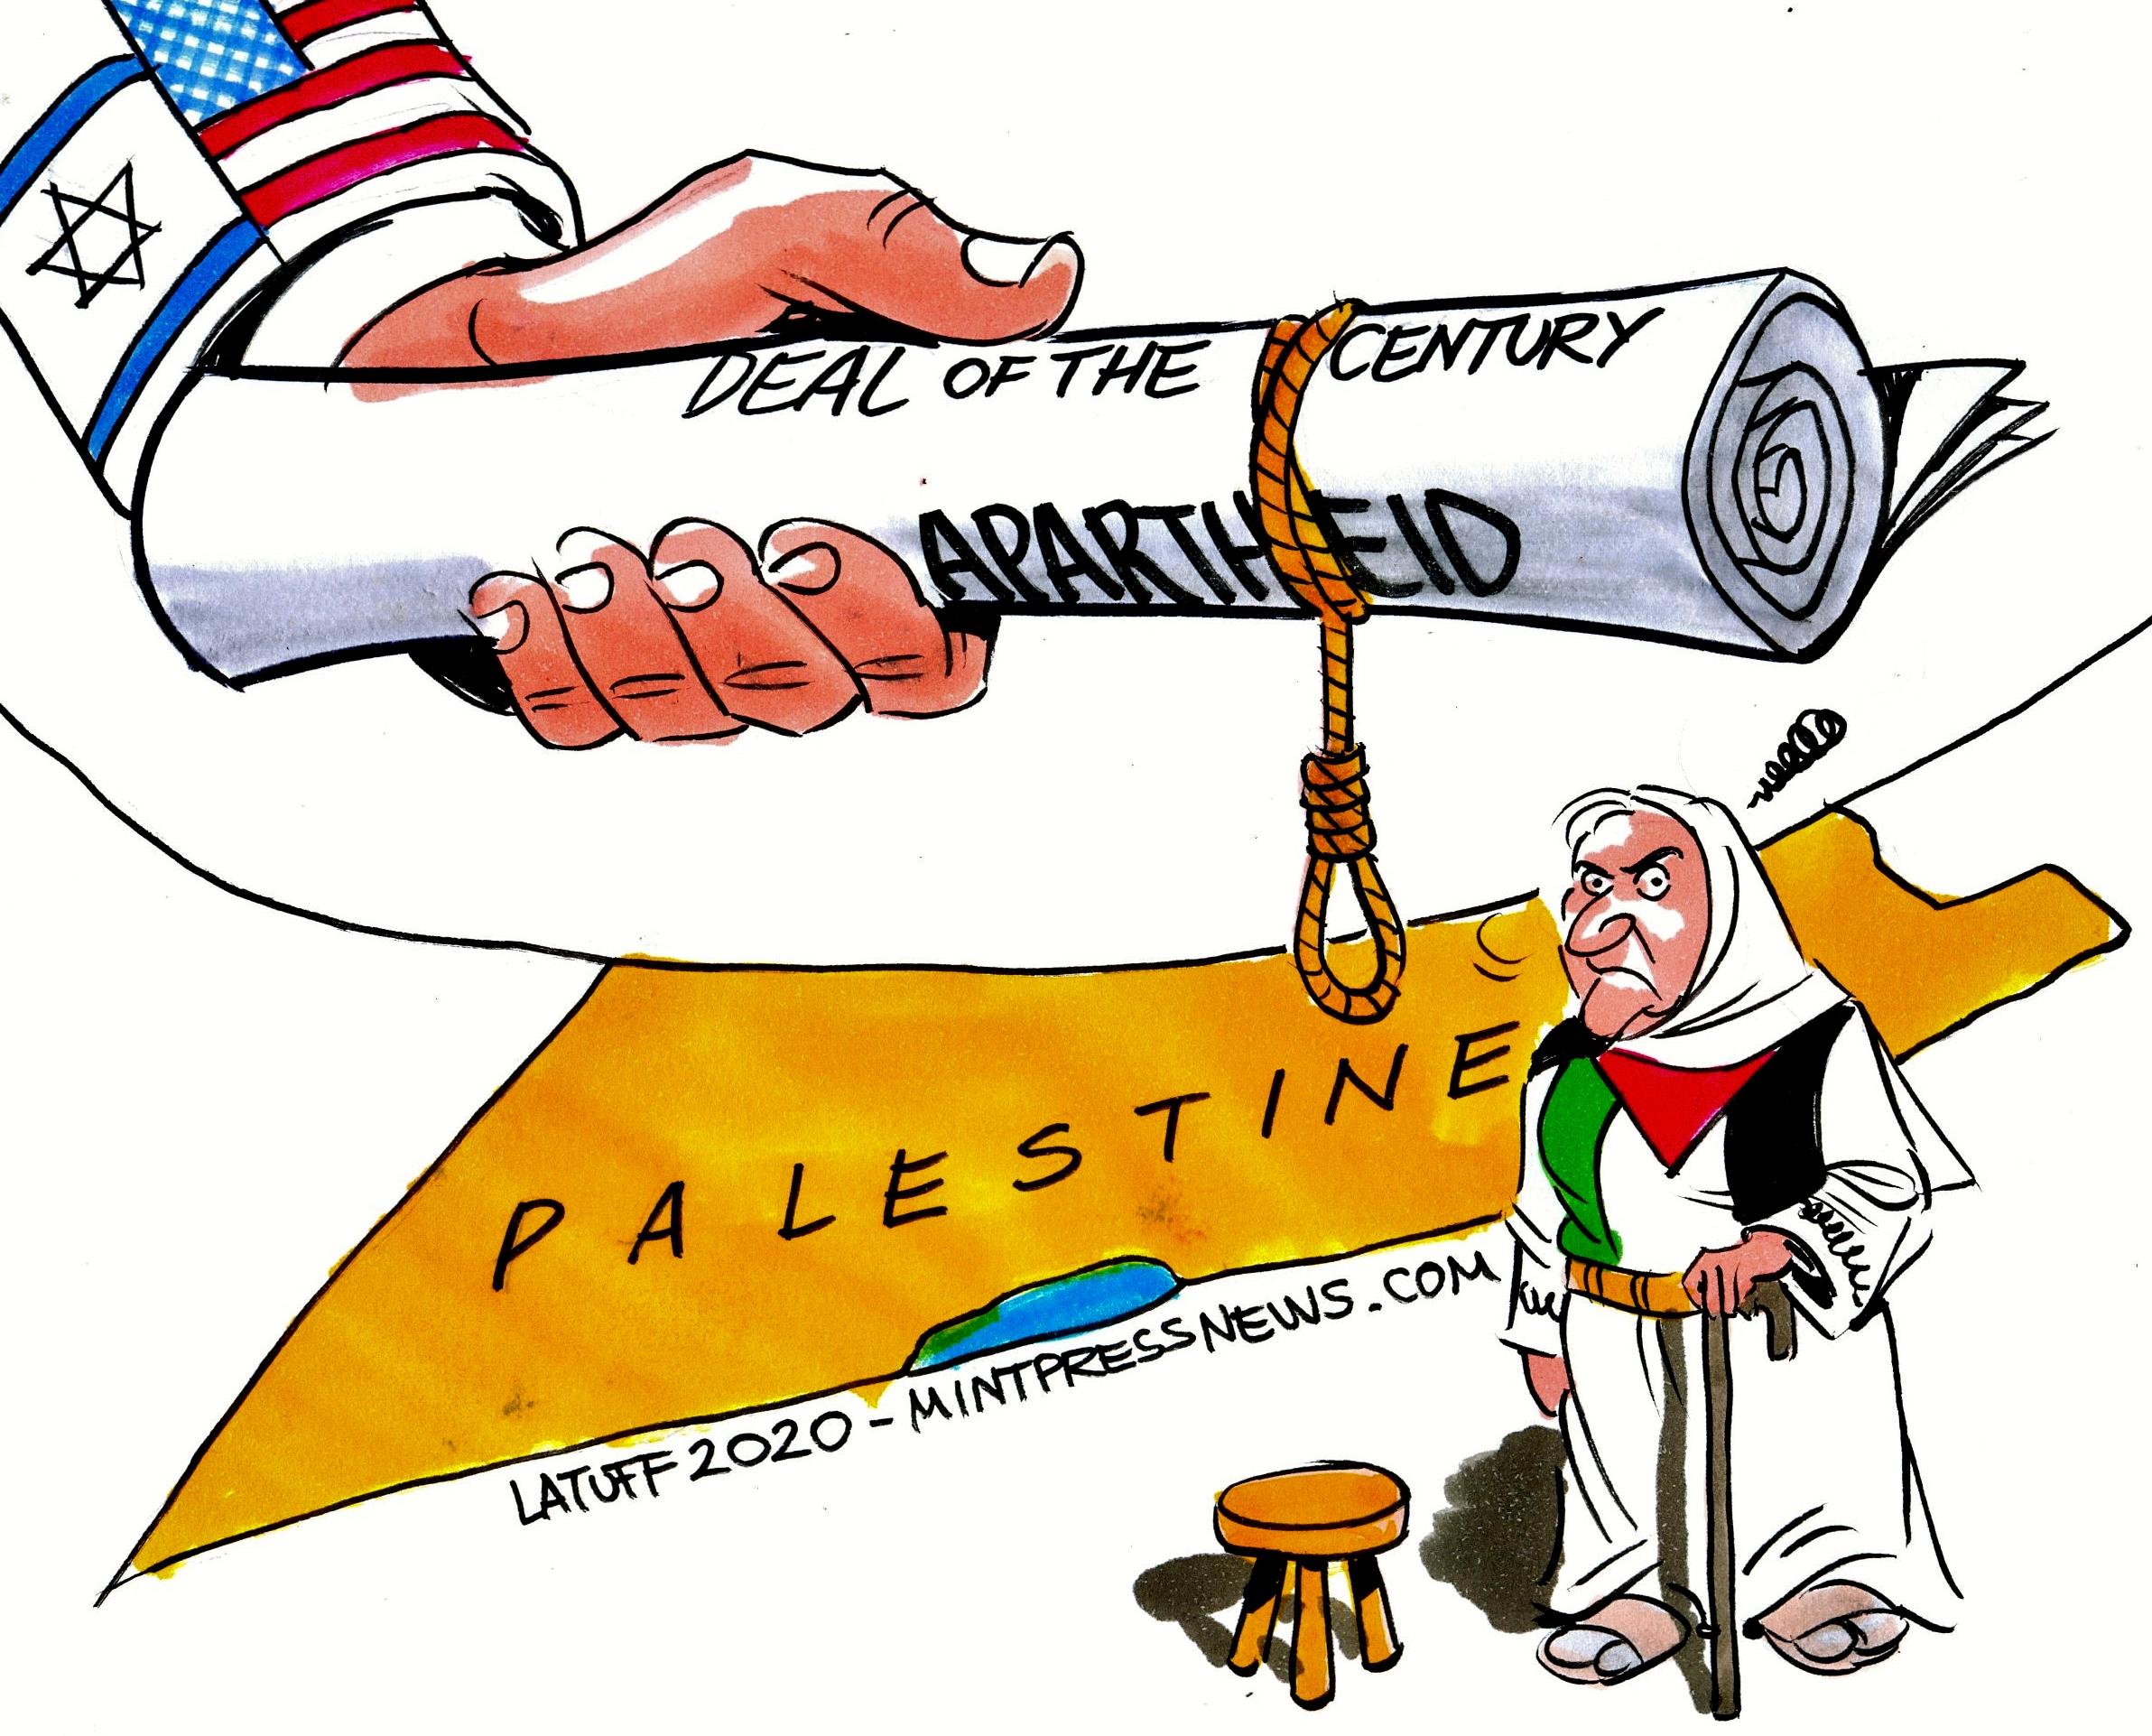 Deal of the Century apartheid Israel Trump Netanyahu Mother Palestine MintPress News